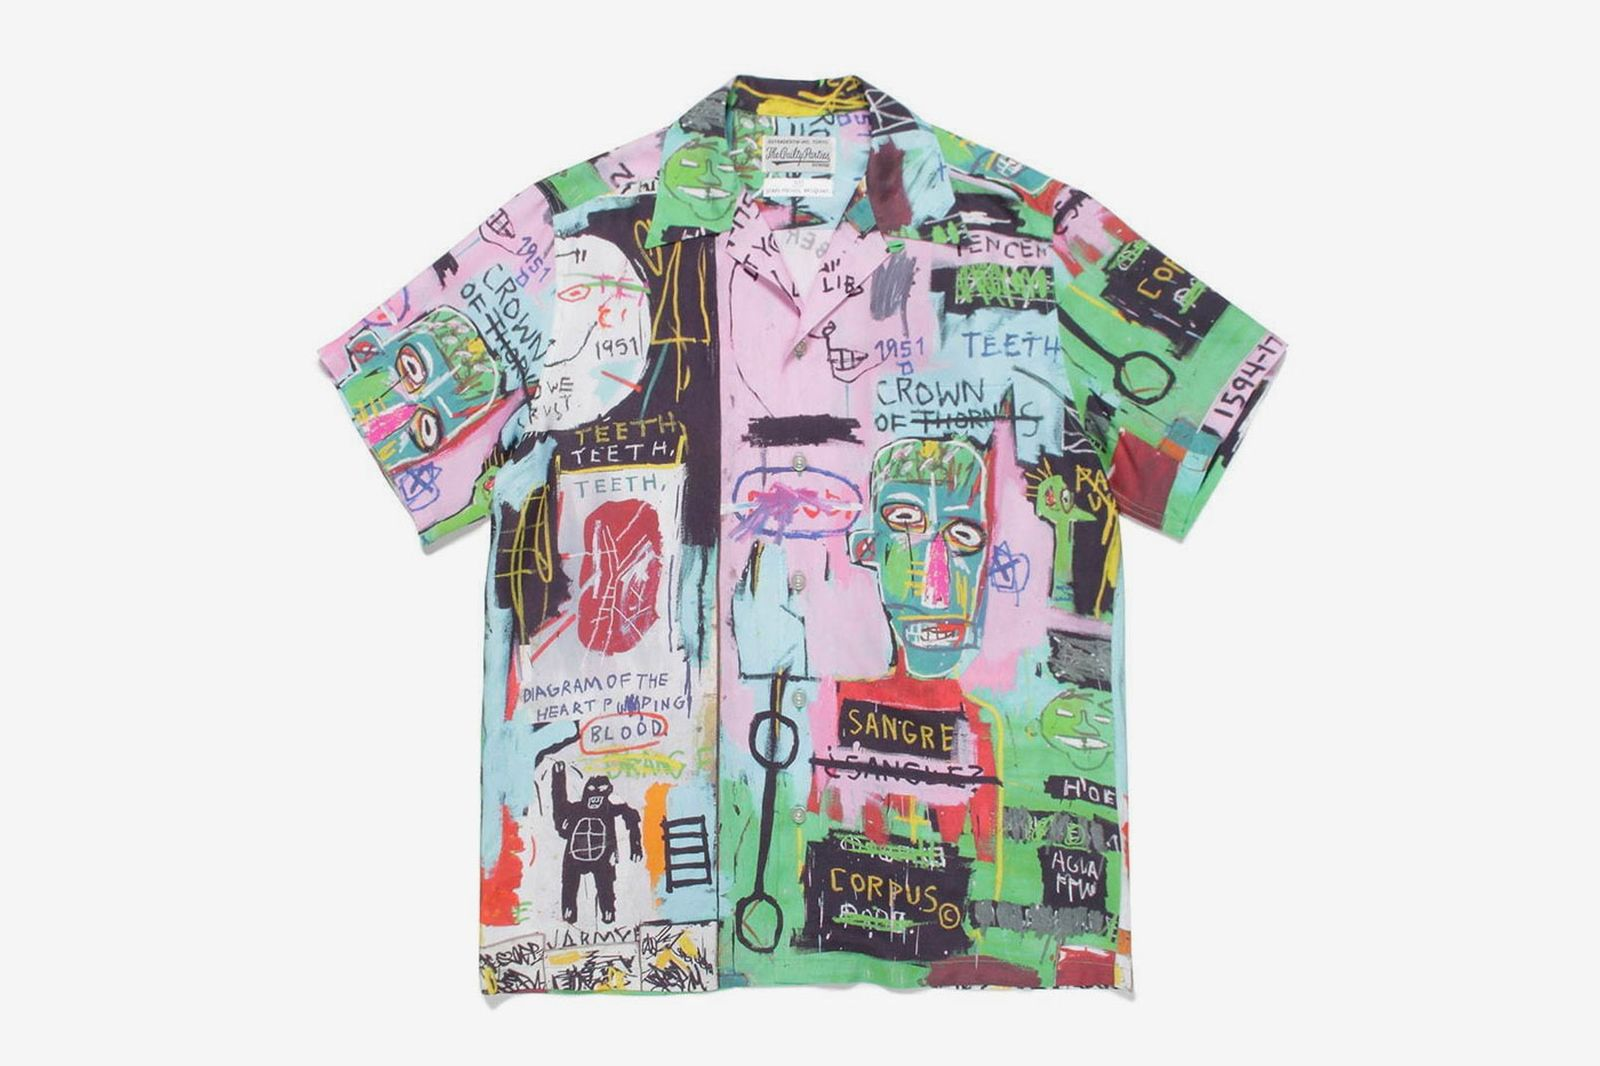 Hs-jean-michel-basquiat-x-wacko-maria-hawaiian-shirt-info-001